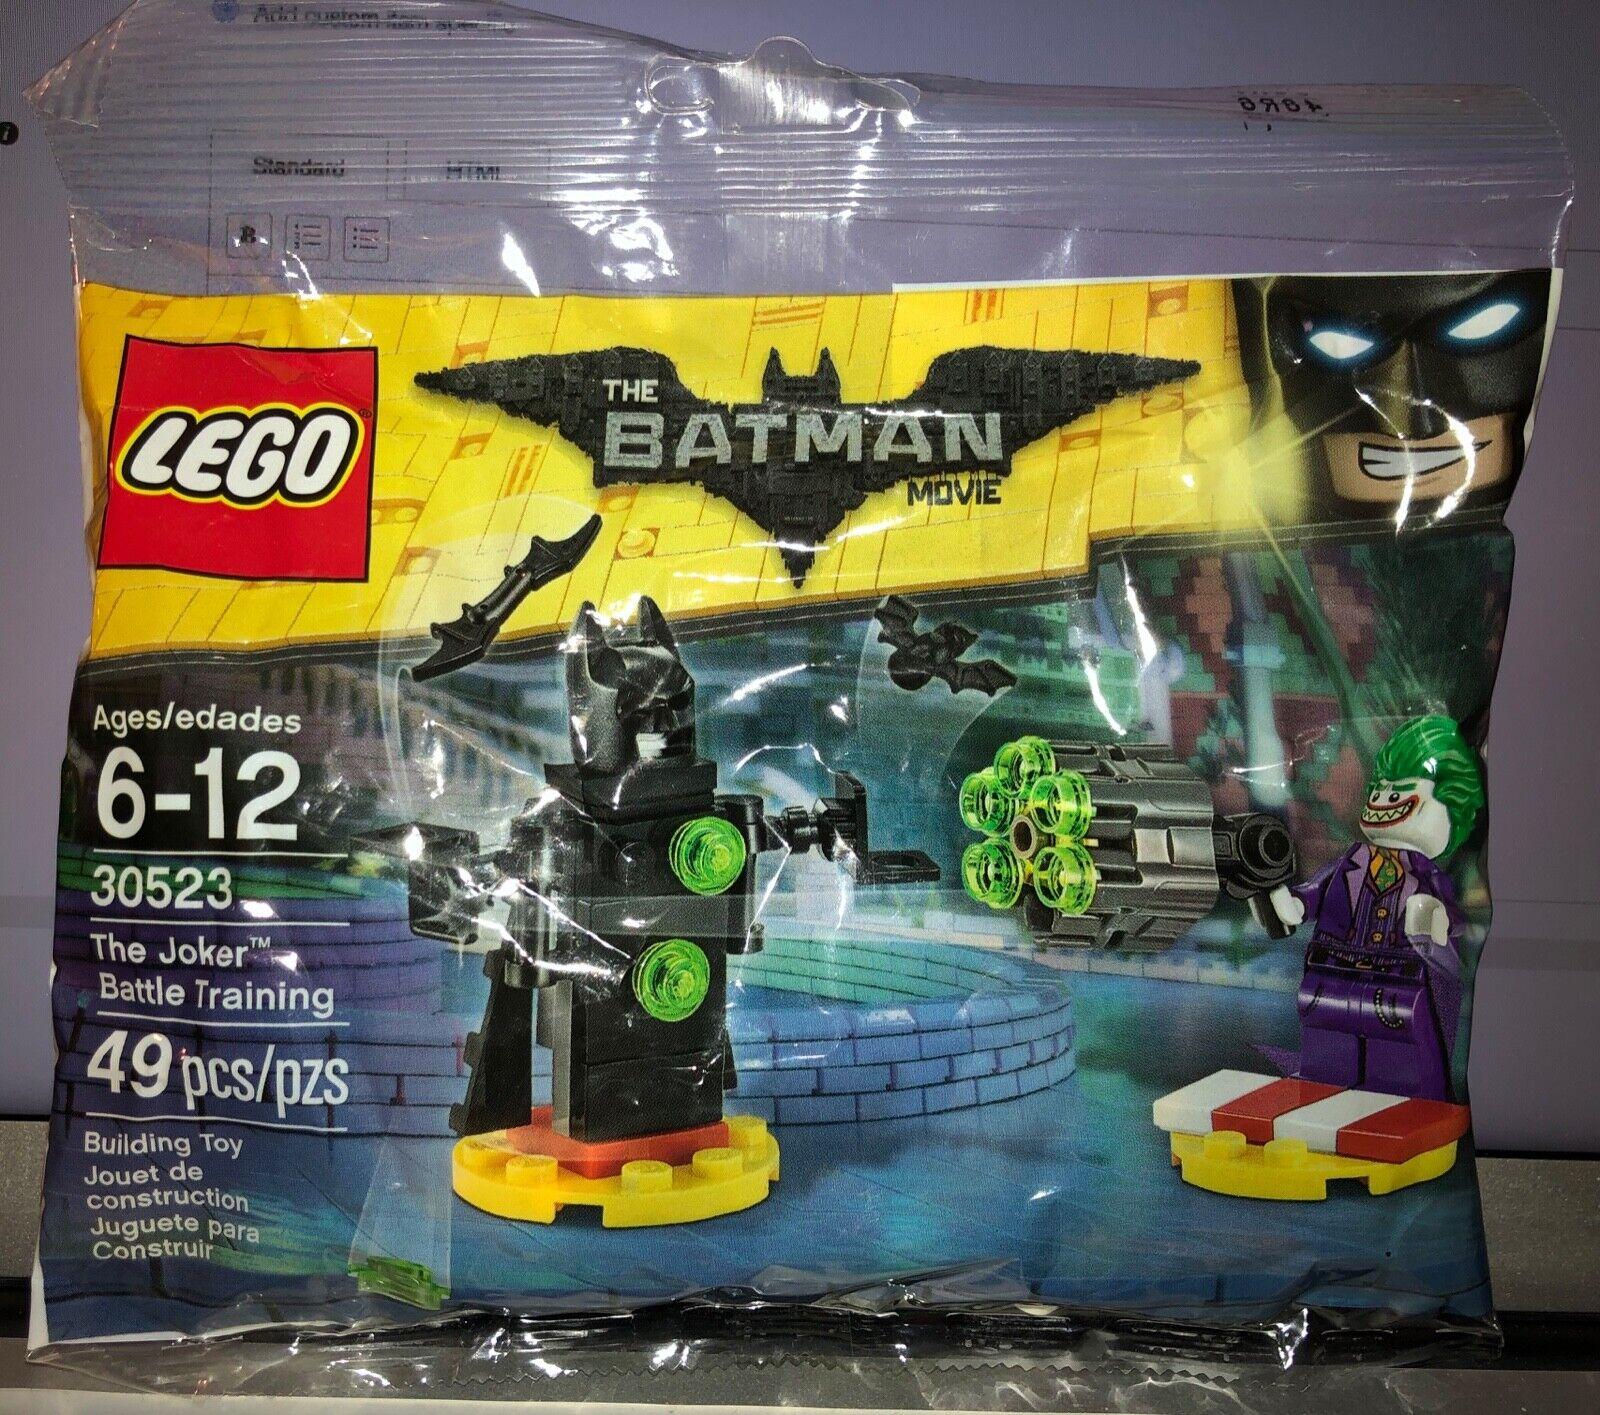 LEGO The Batman Movie 30523 The Joker Battle Training New /& Sealed